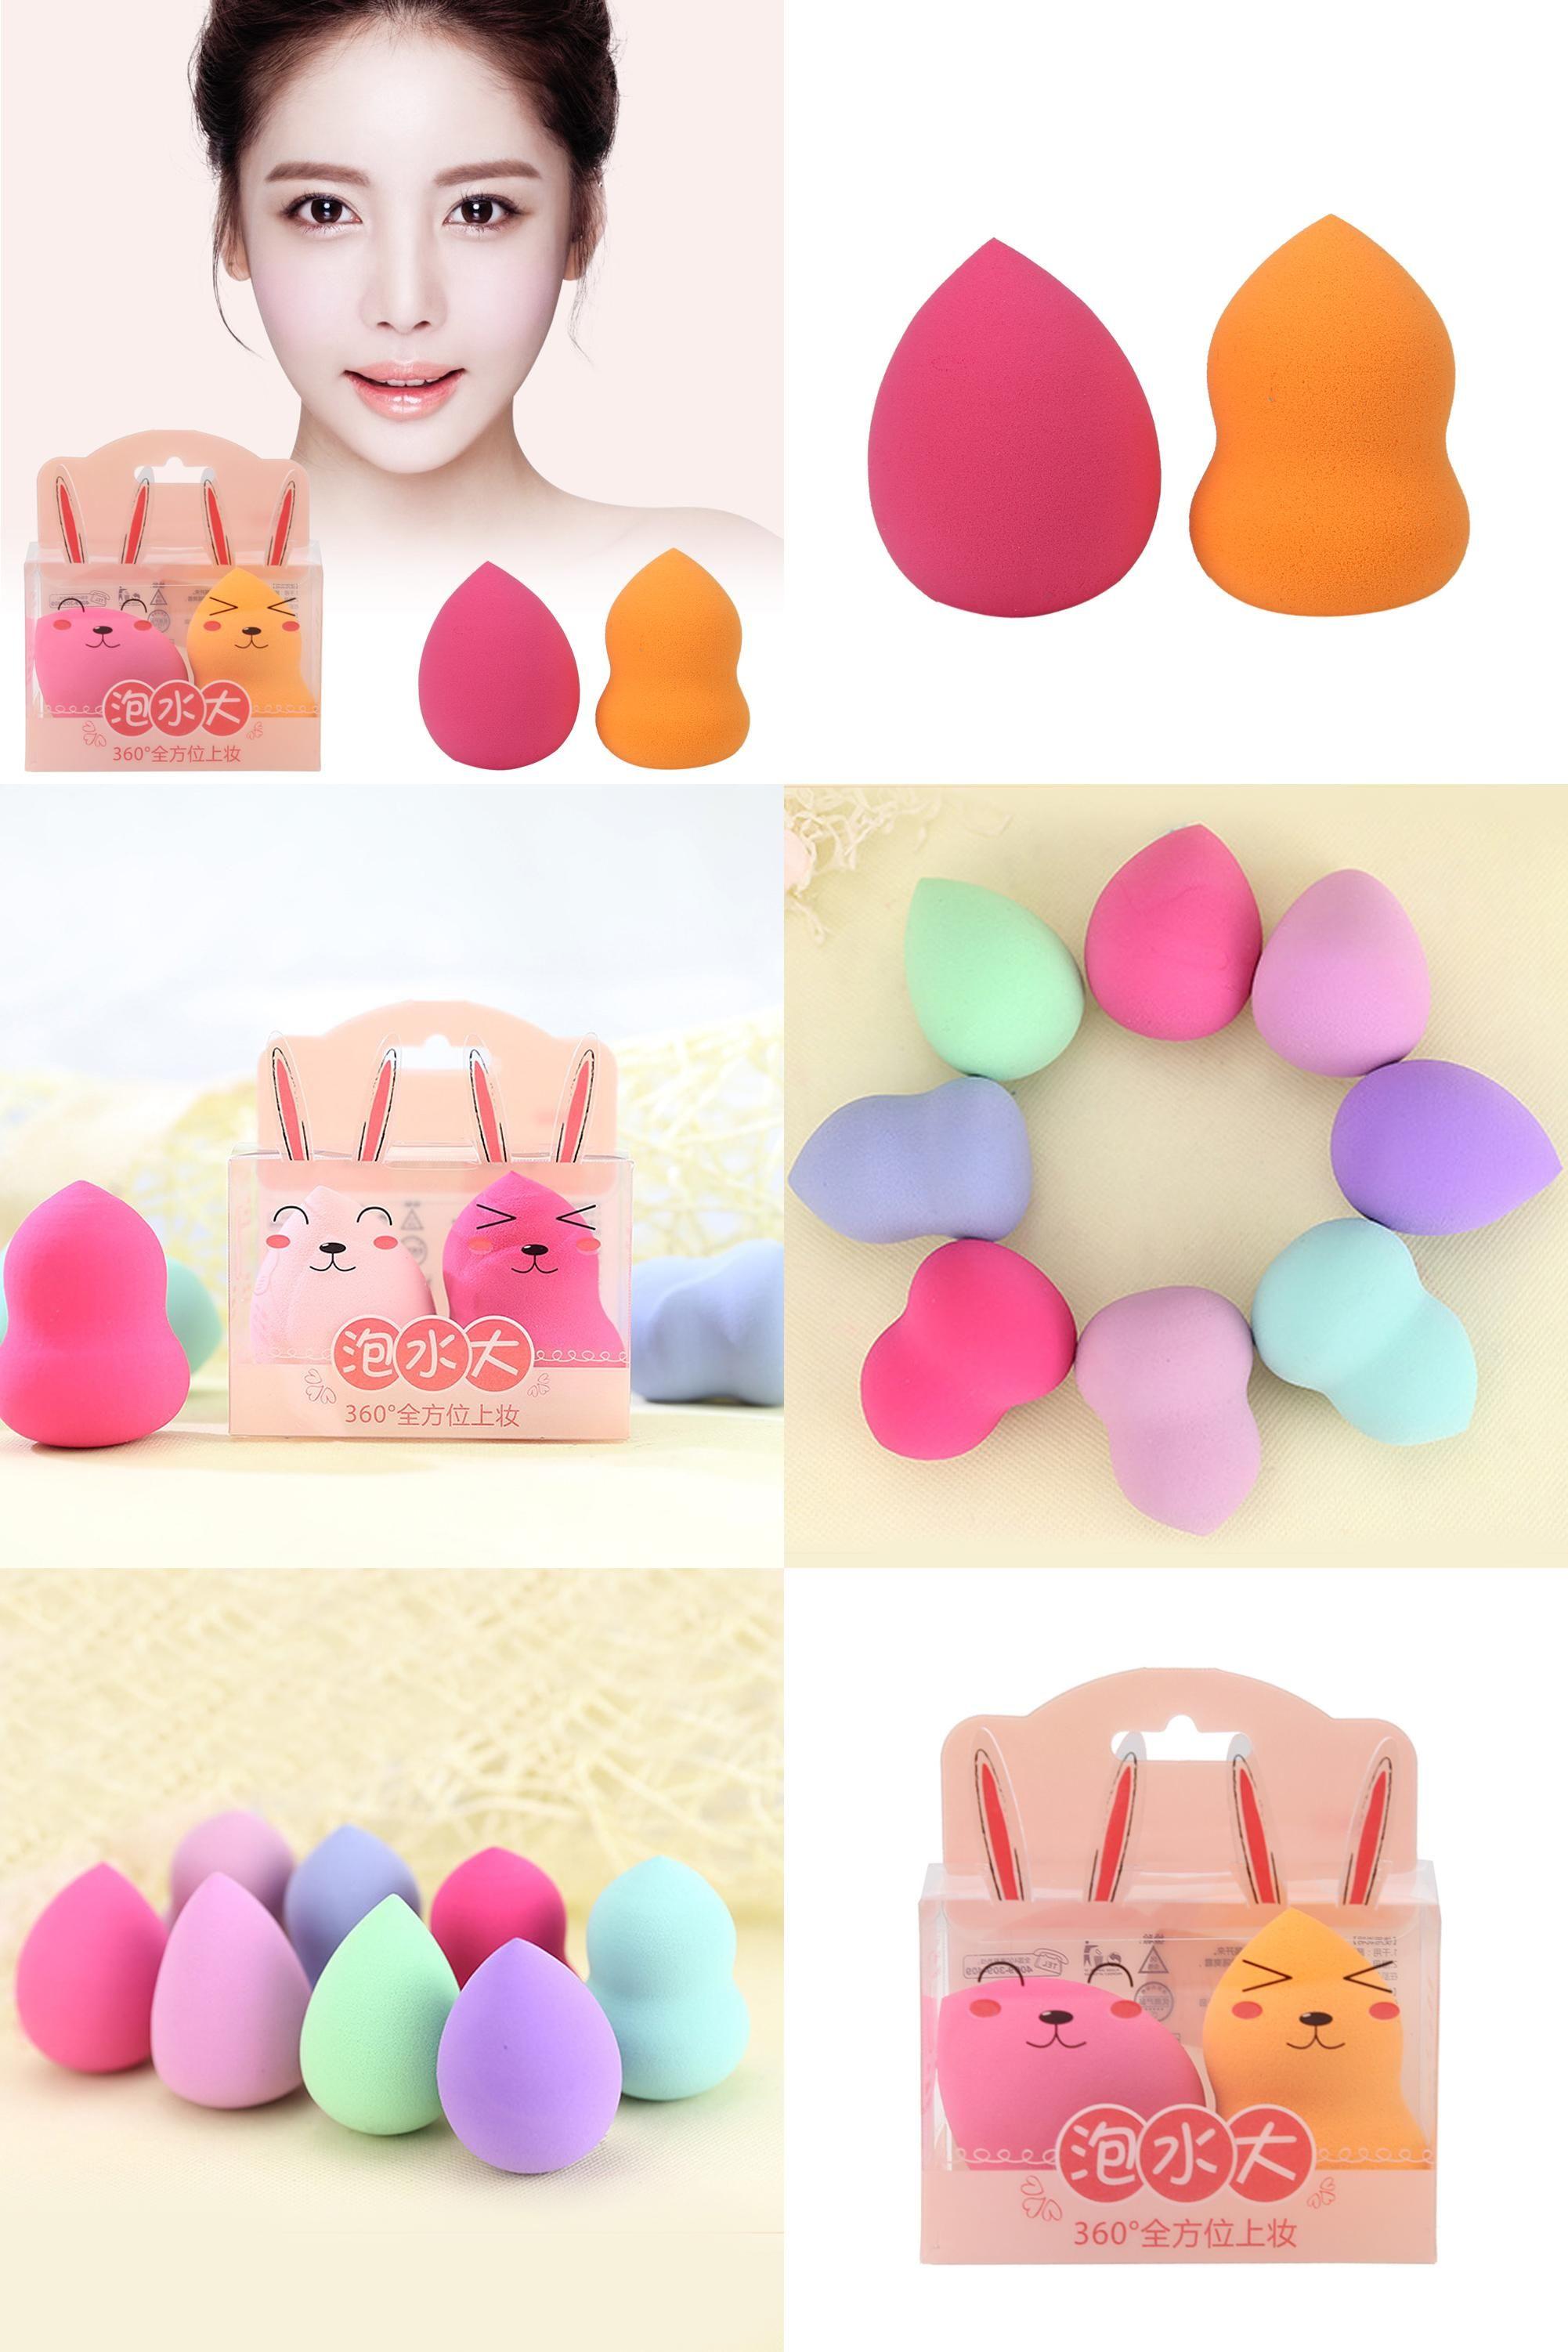 [Visit to Buy] 2pcs Makeup Sponge Cosmetics Puff Flawless